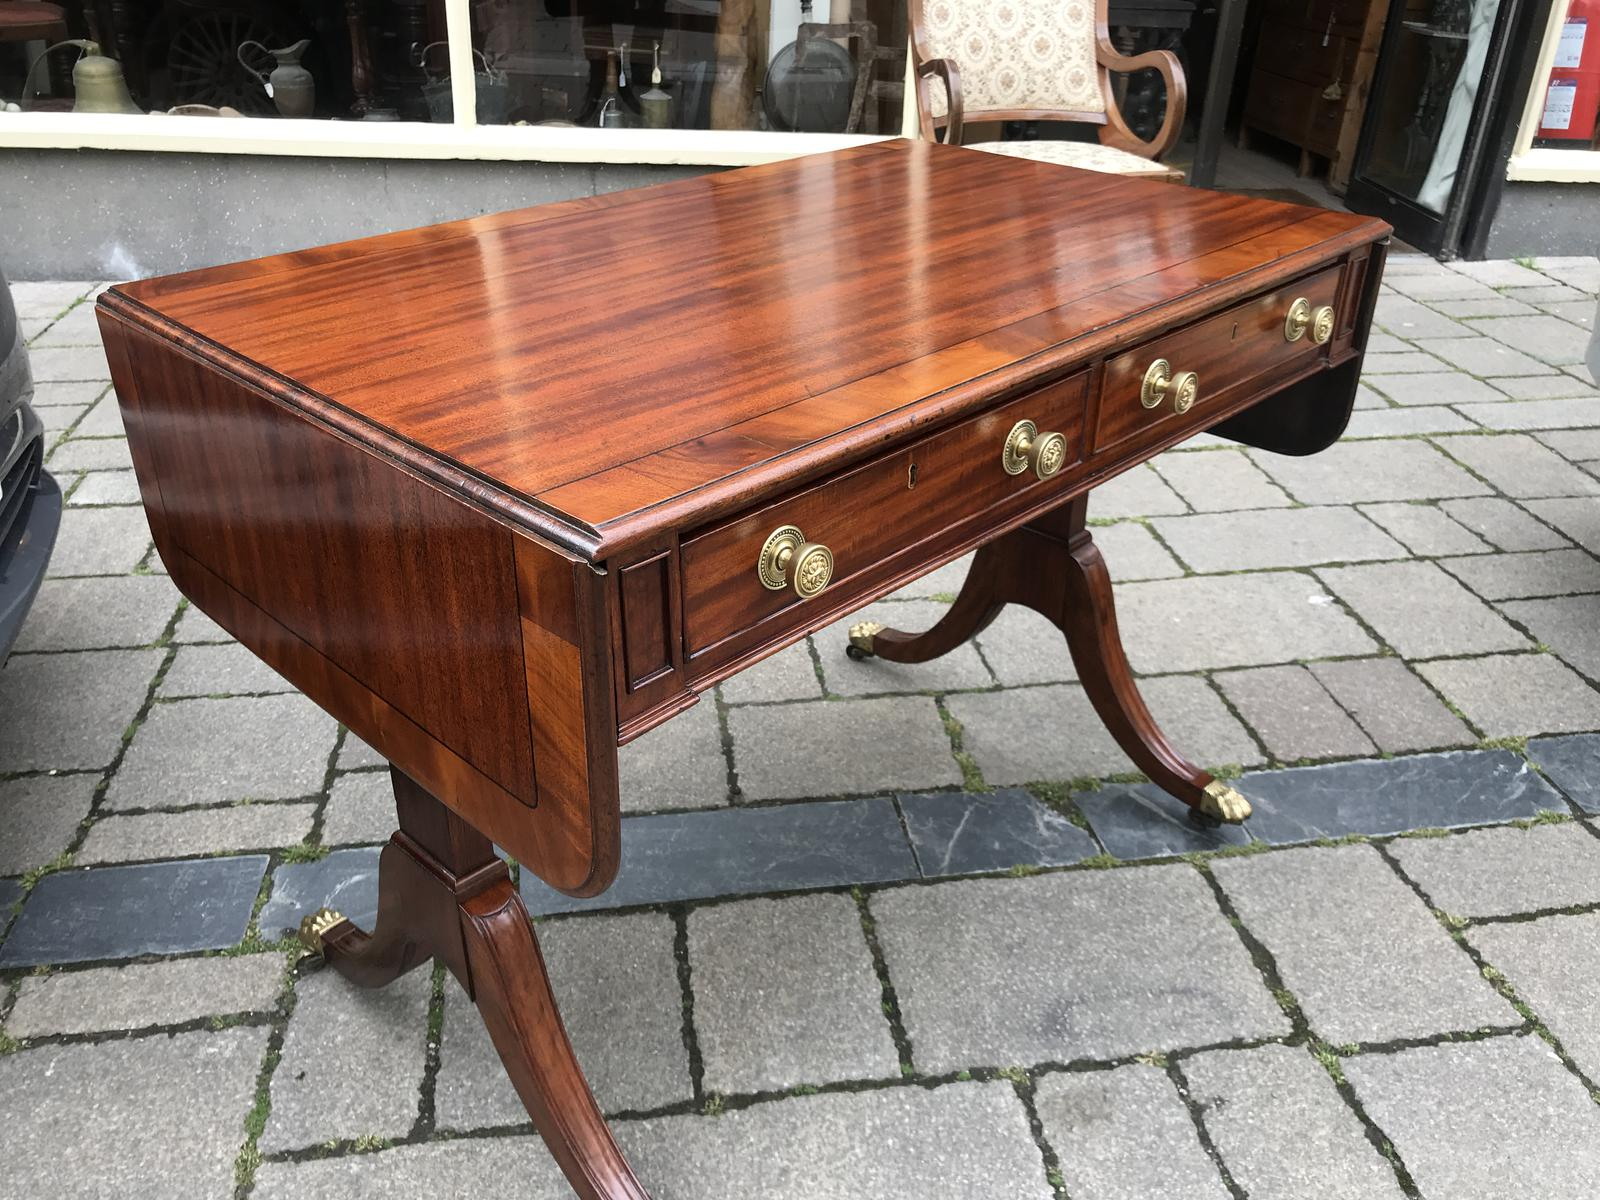 Mahogany Inlaid Sofa Table (1 of 1)